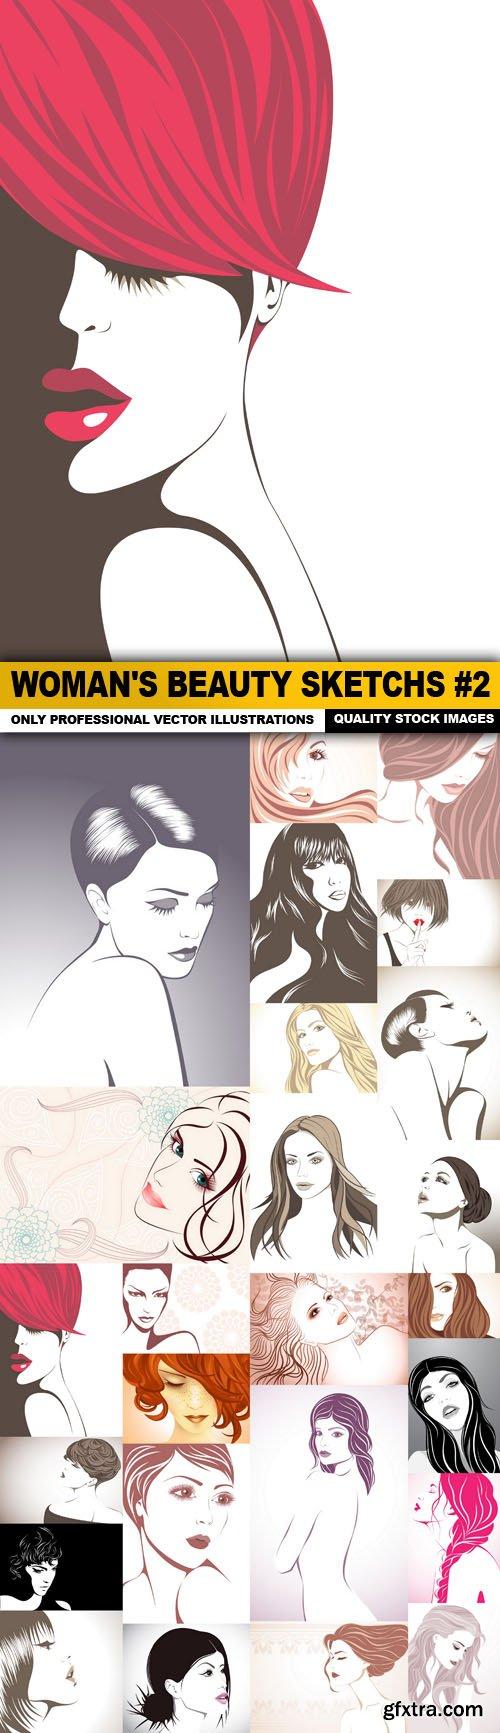 Woman's Beauty Sketchs #2 - 25 Vector